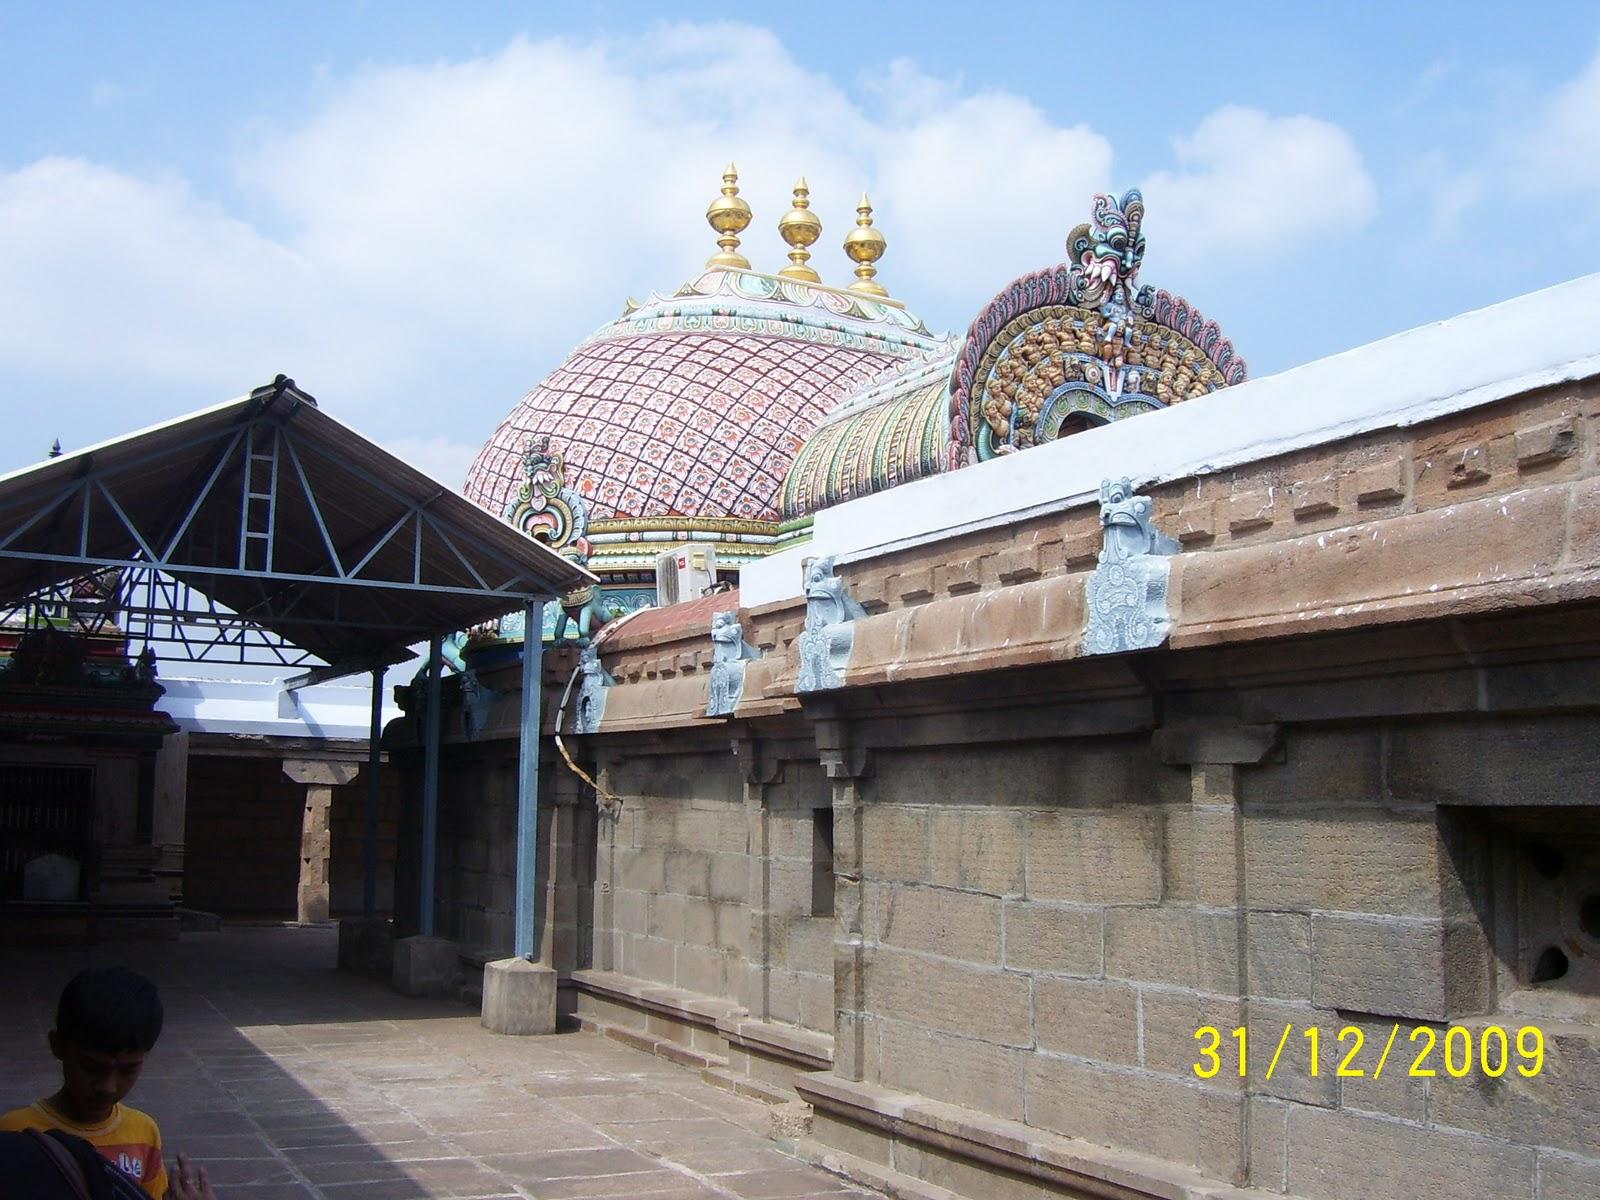 Sri Nindra Narayana Perumal Temple (Thiruthangal) Madurai - Divya Desam 75